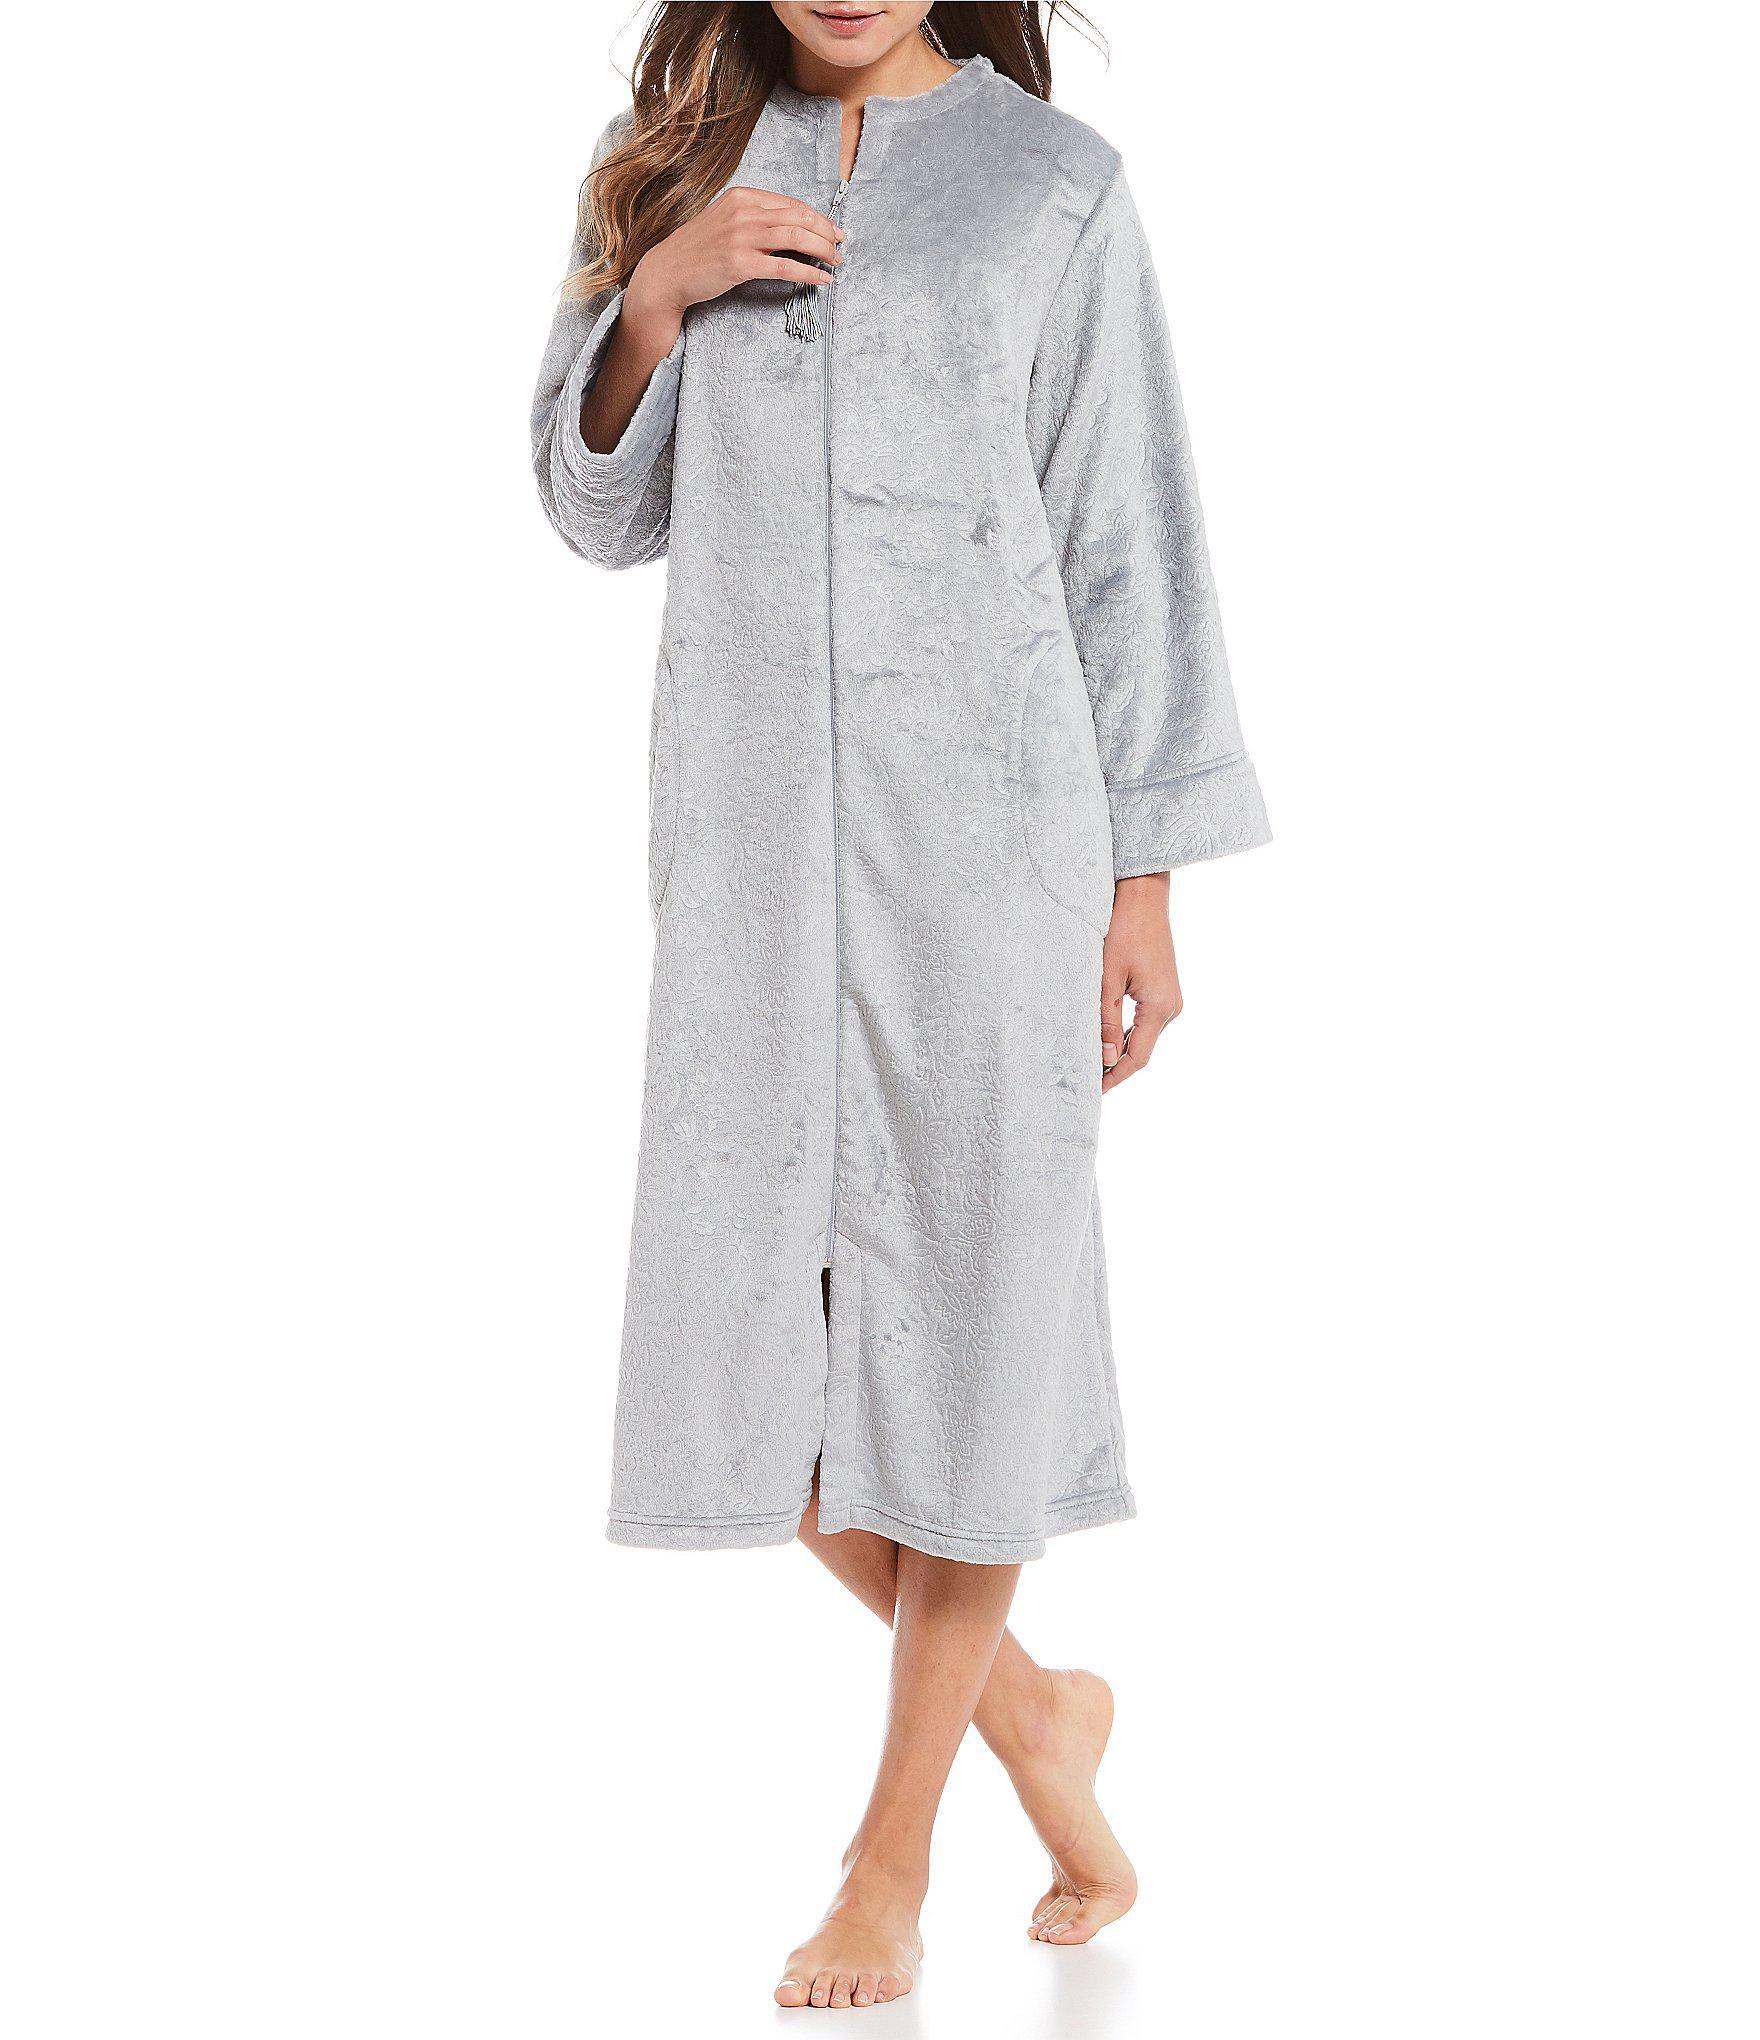 Lyst - Miss Elaine Embossed French Fleece Zip-front Long Robe in Gray 2b6515039